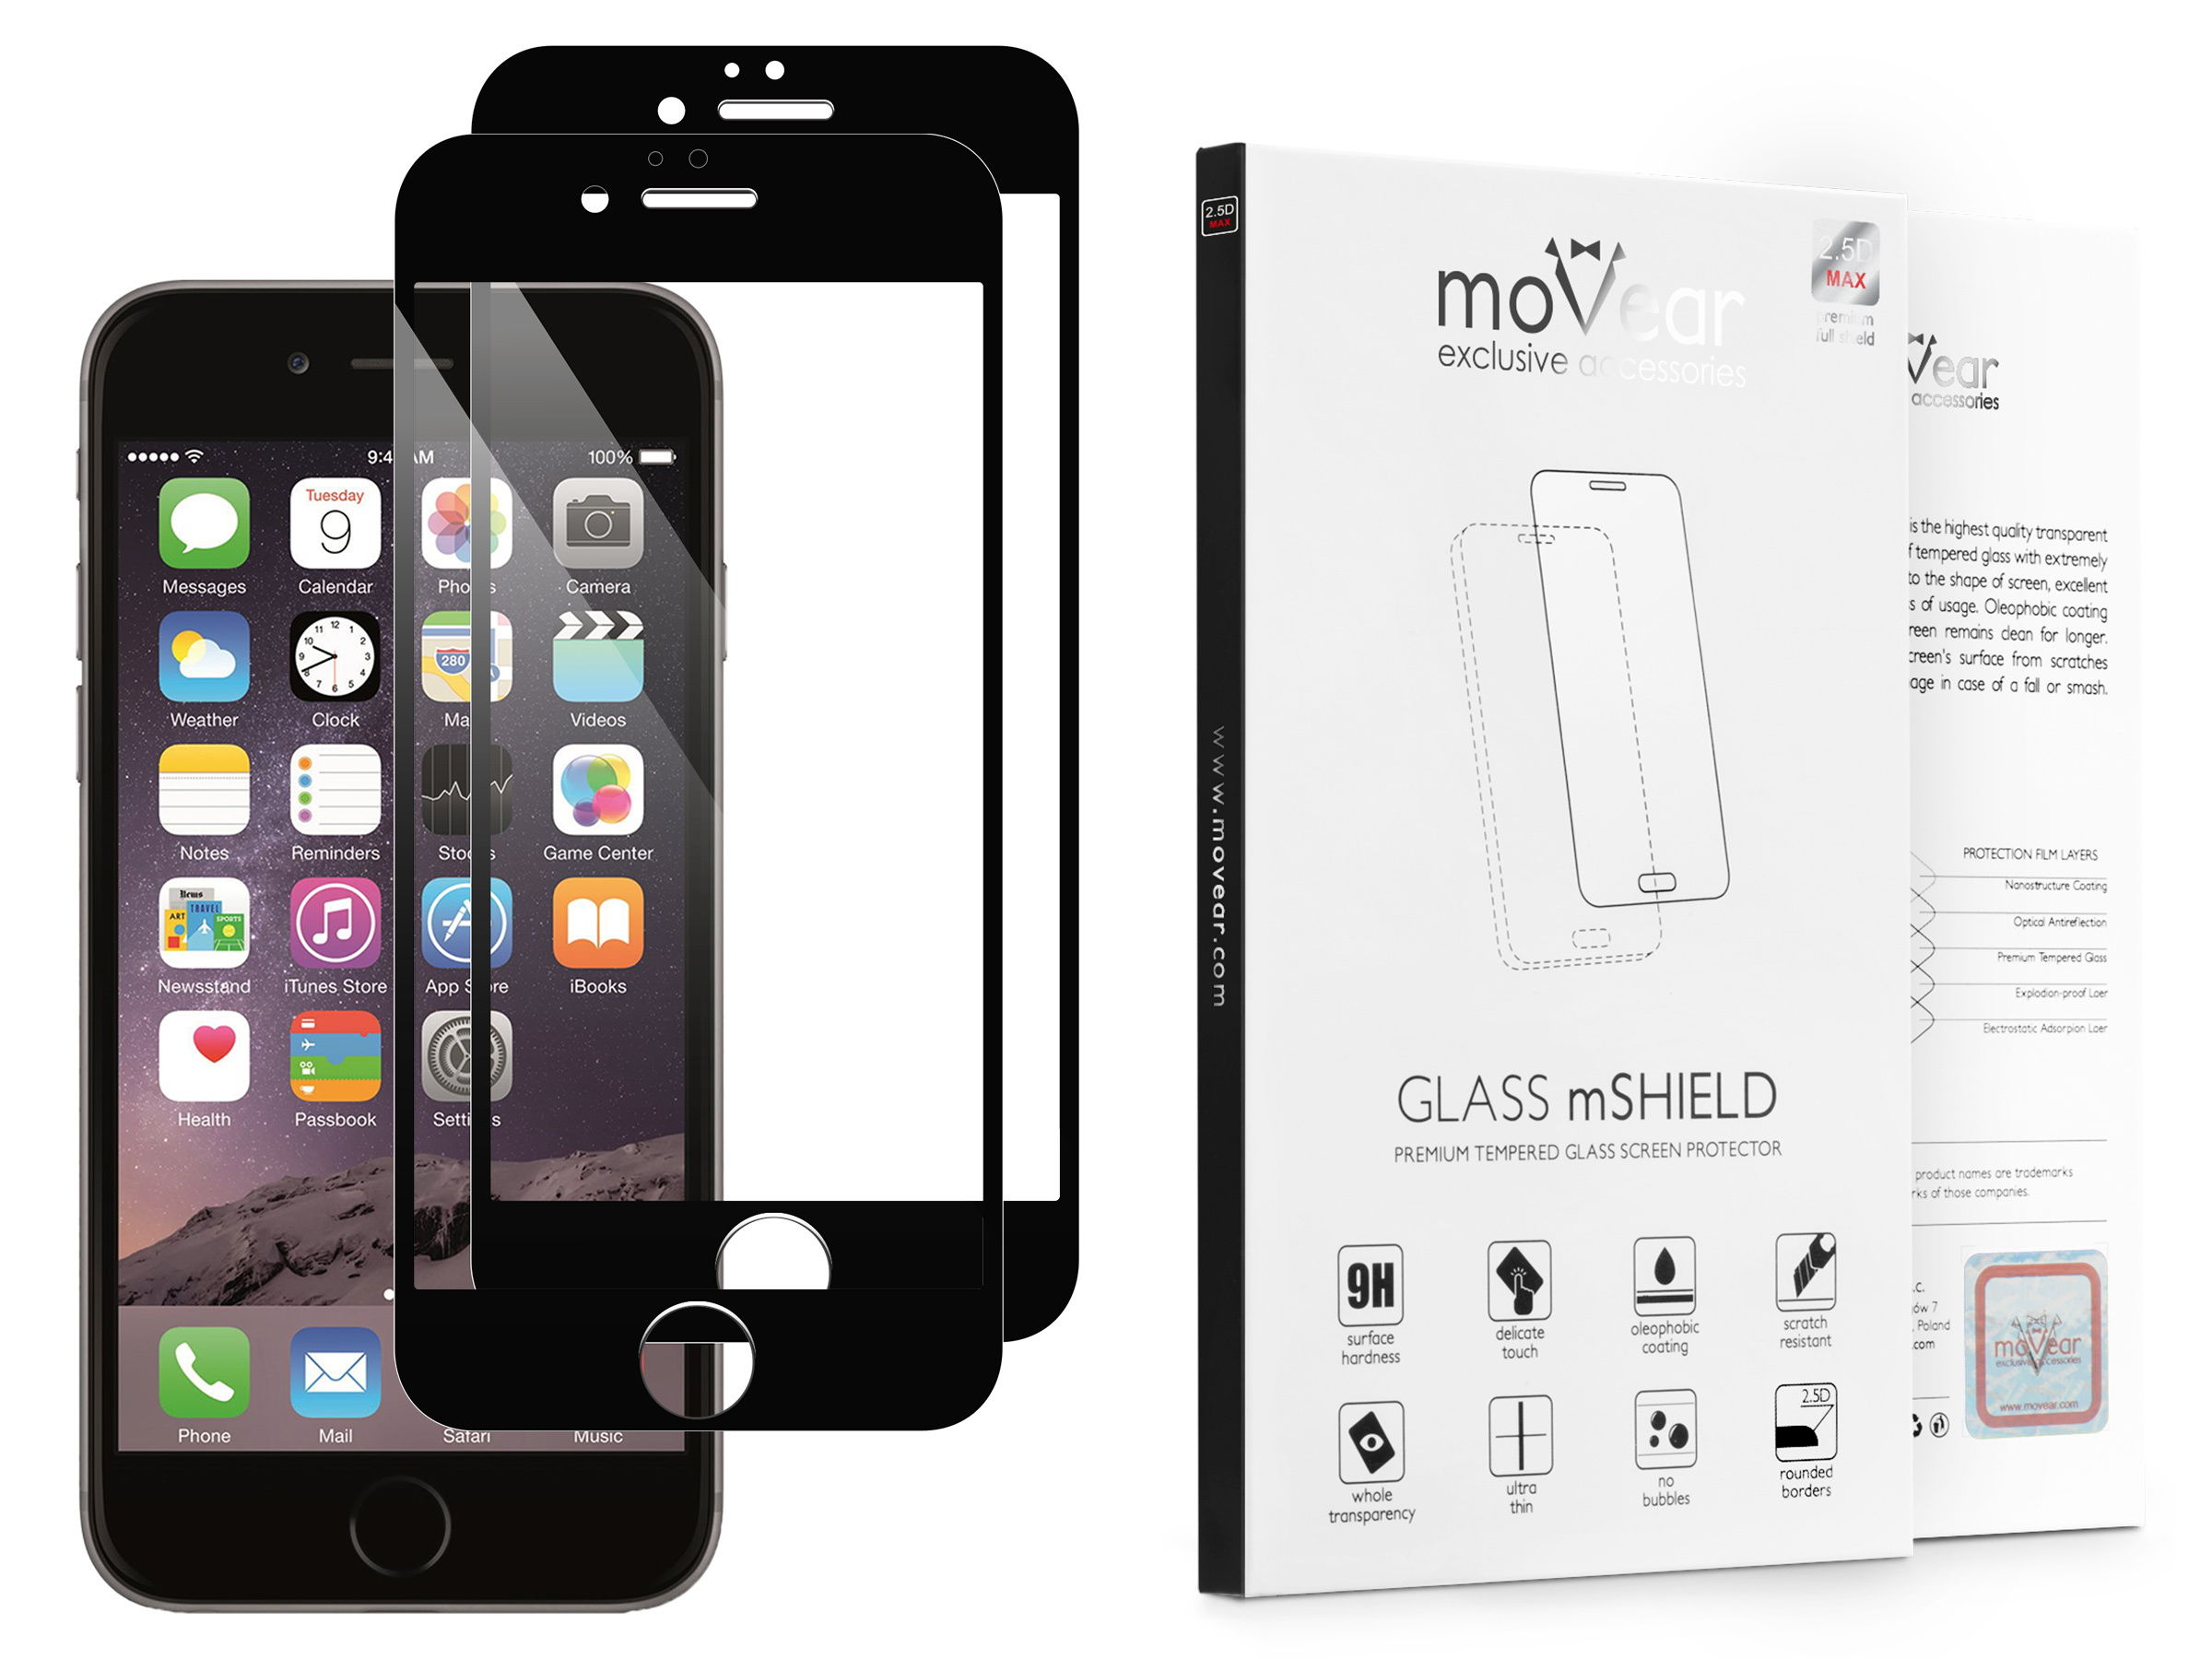 2 szt.   moVear Szkło Hartowane 2.5D MAX na Apple iPhone 6 Plus / 6s Plus   do etui, 9H   GLASS mSHIELD Czarny